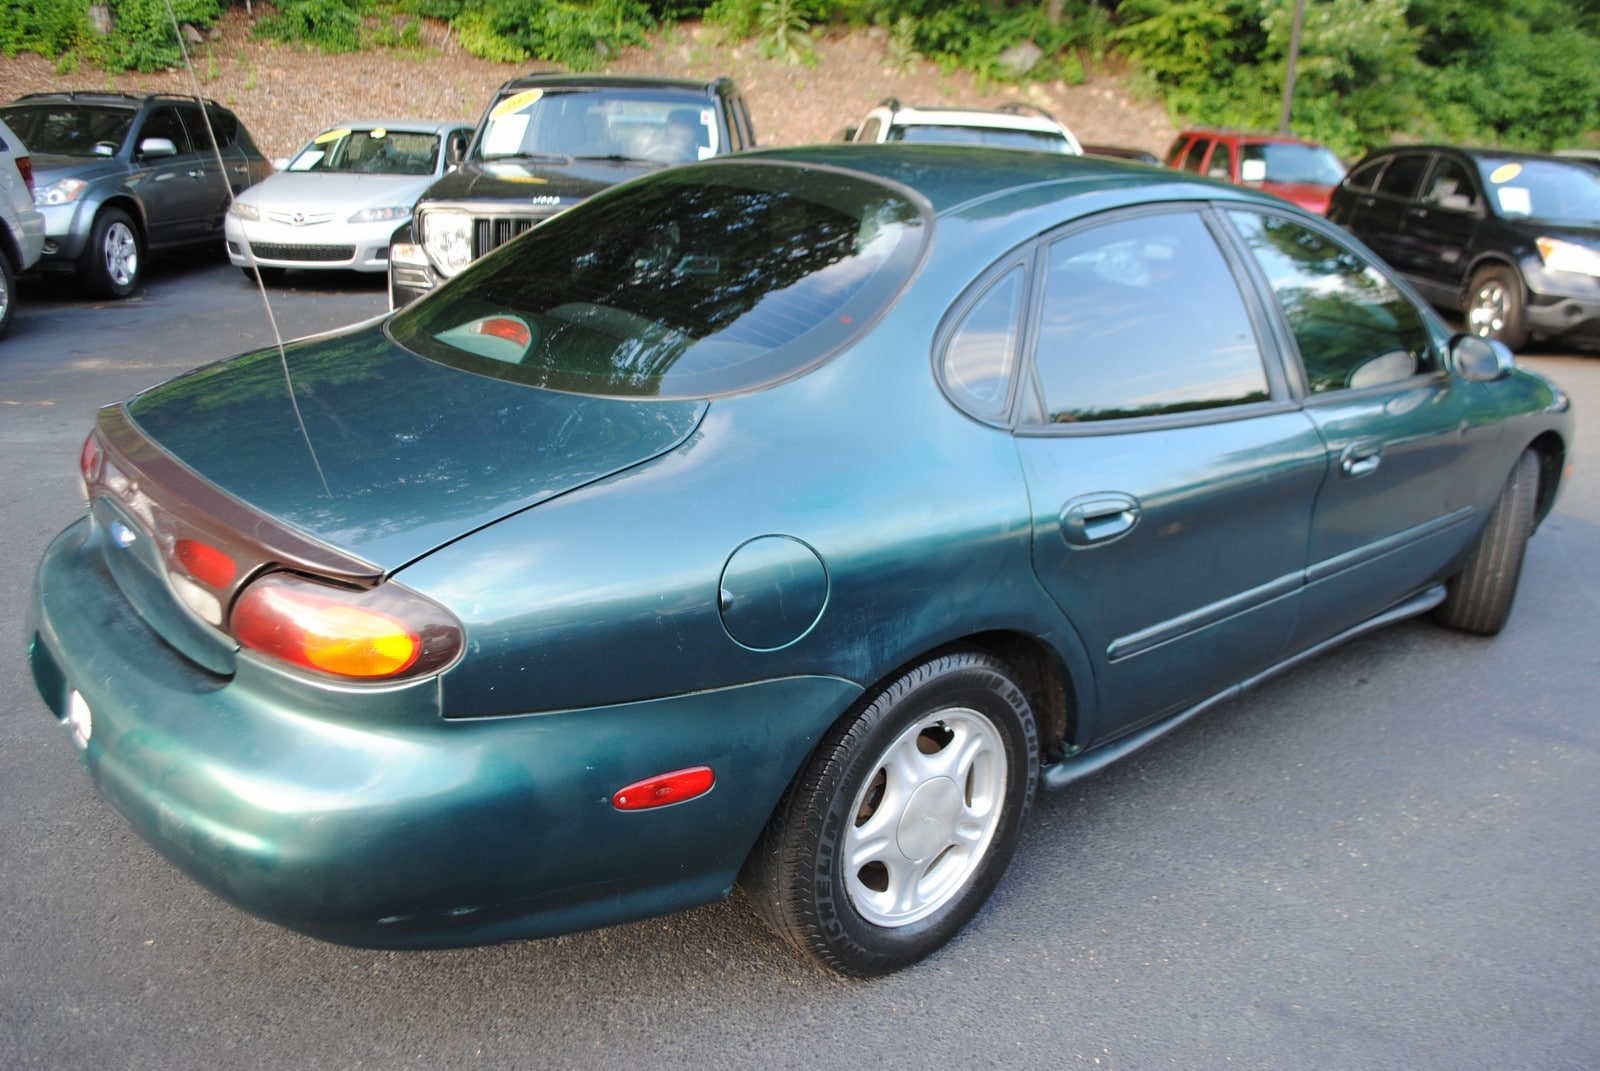 used 1997 ford taurus for sale west milford nj Pimped Out 1997 Taurus GL 1997 ford taurus gl 3 sedan